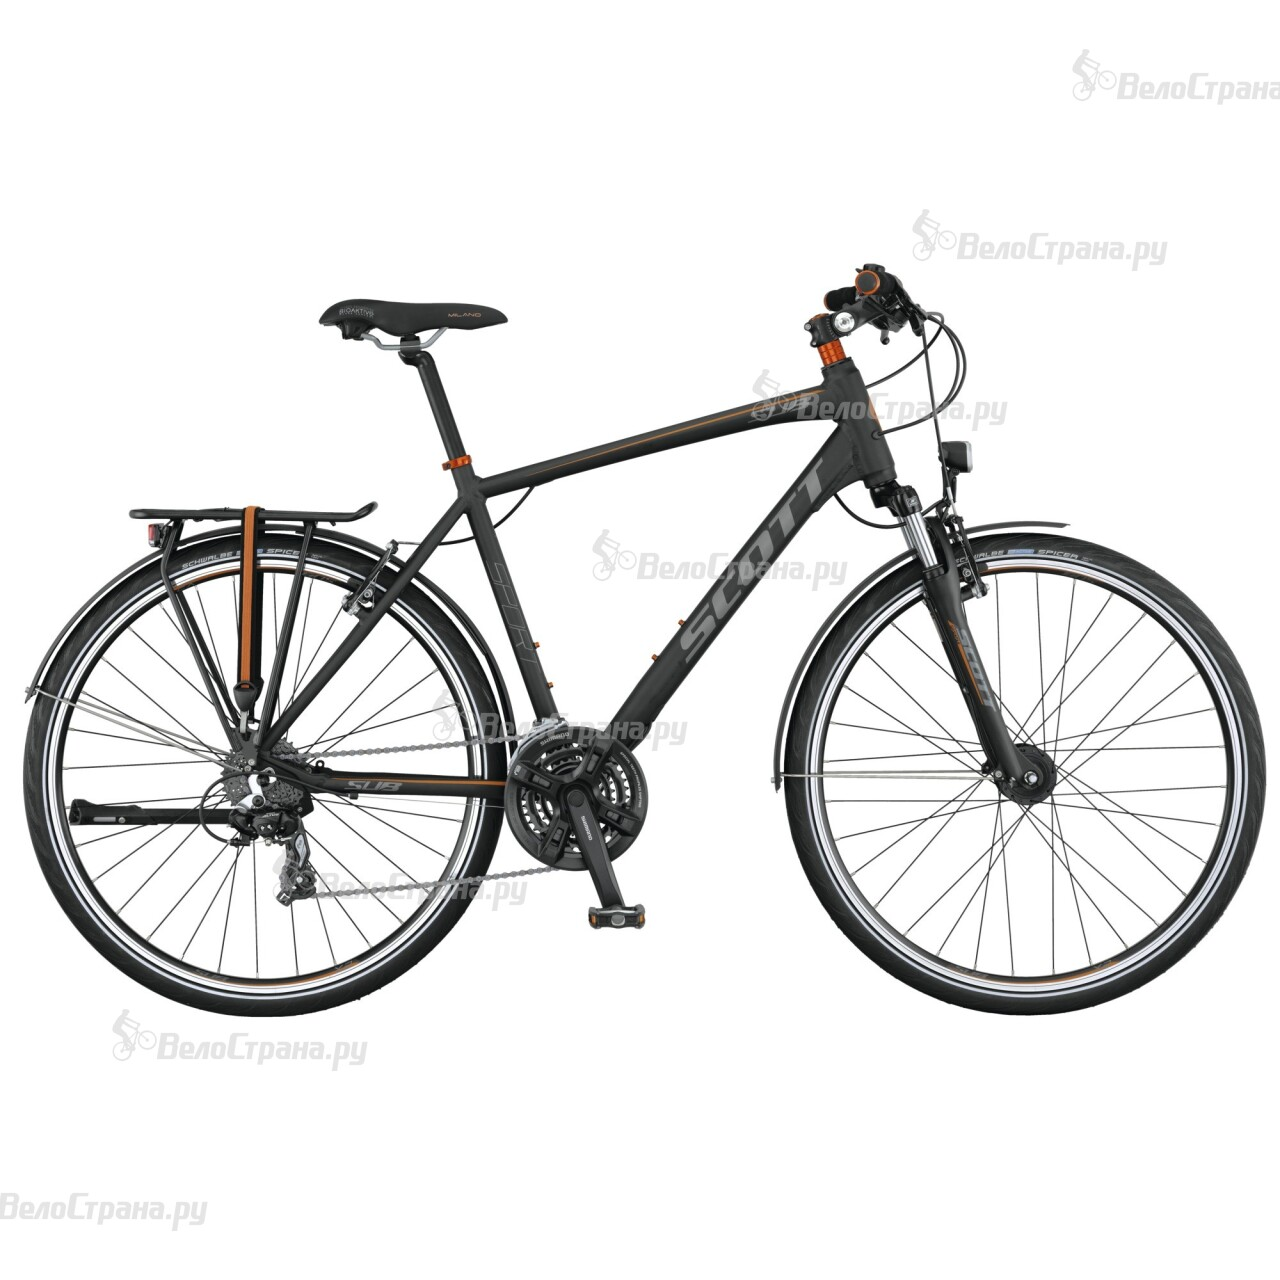 Велосипед Scott Sub Sport 30 Men (2015)